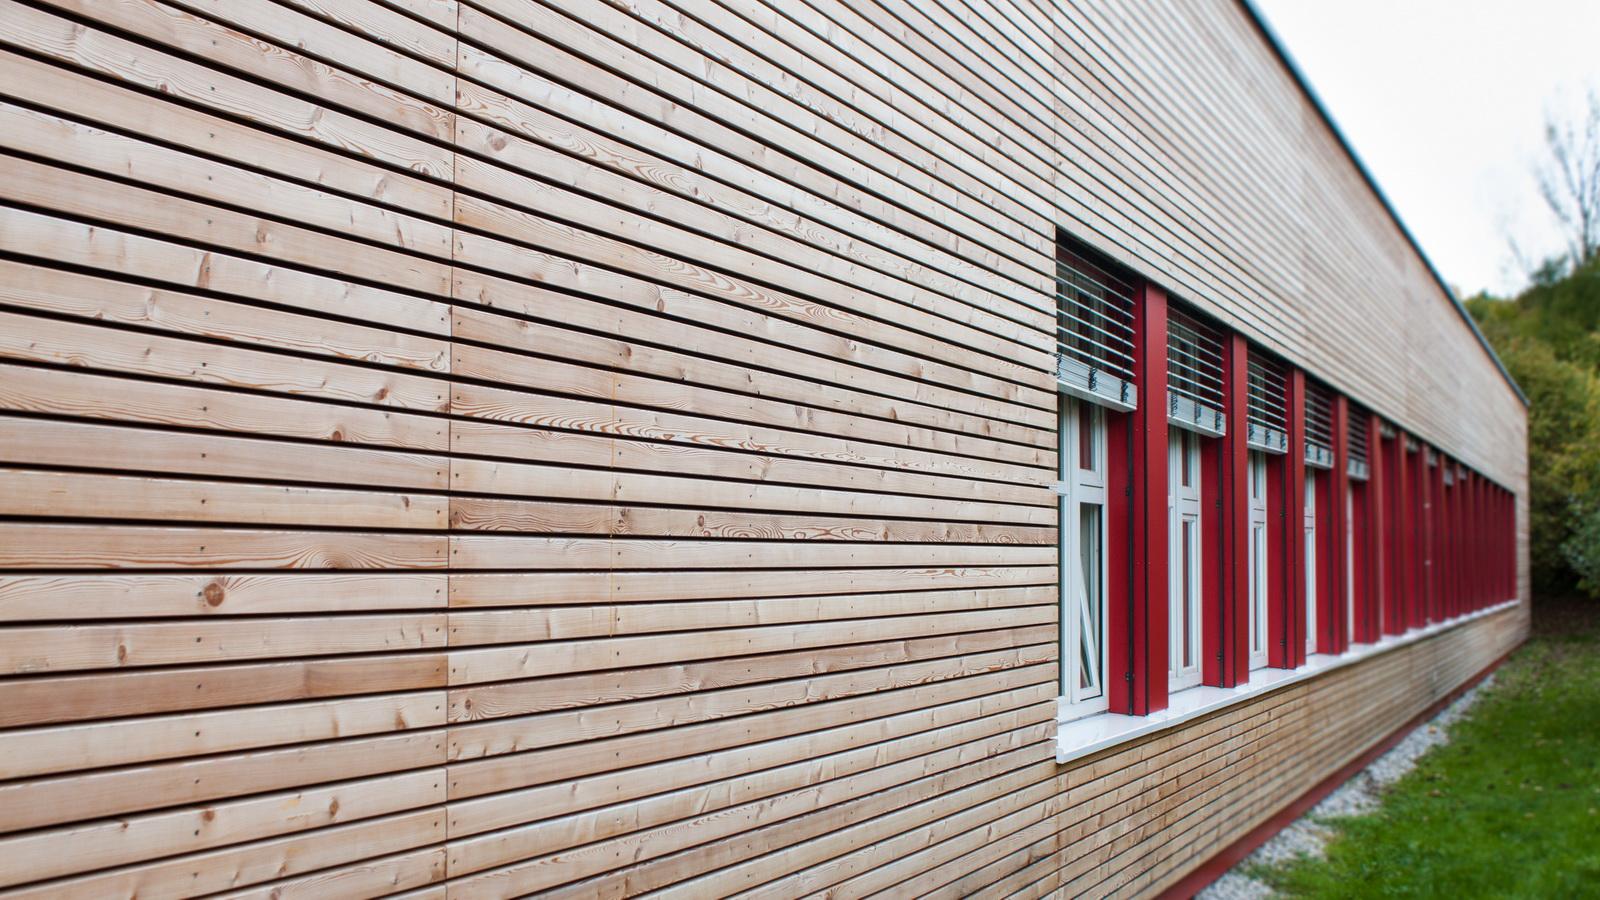 Holzfassade der Grundschule Grafrath